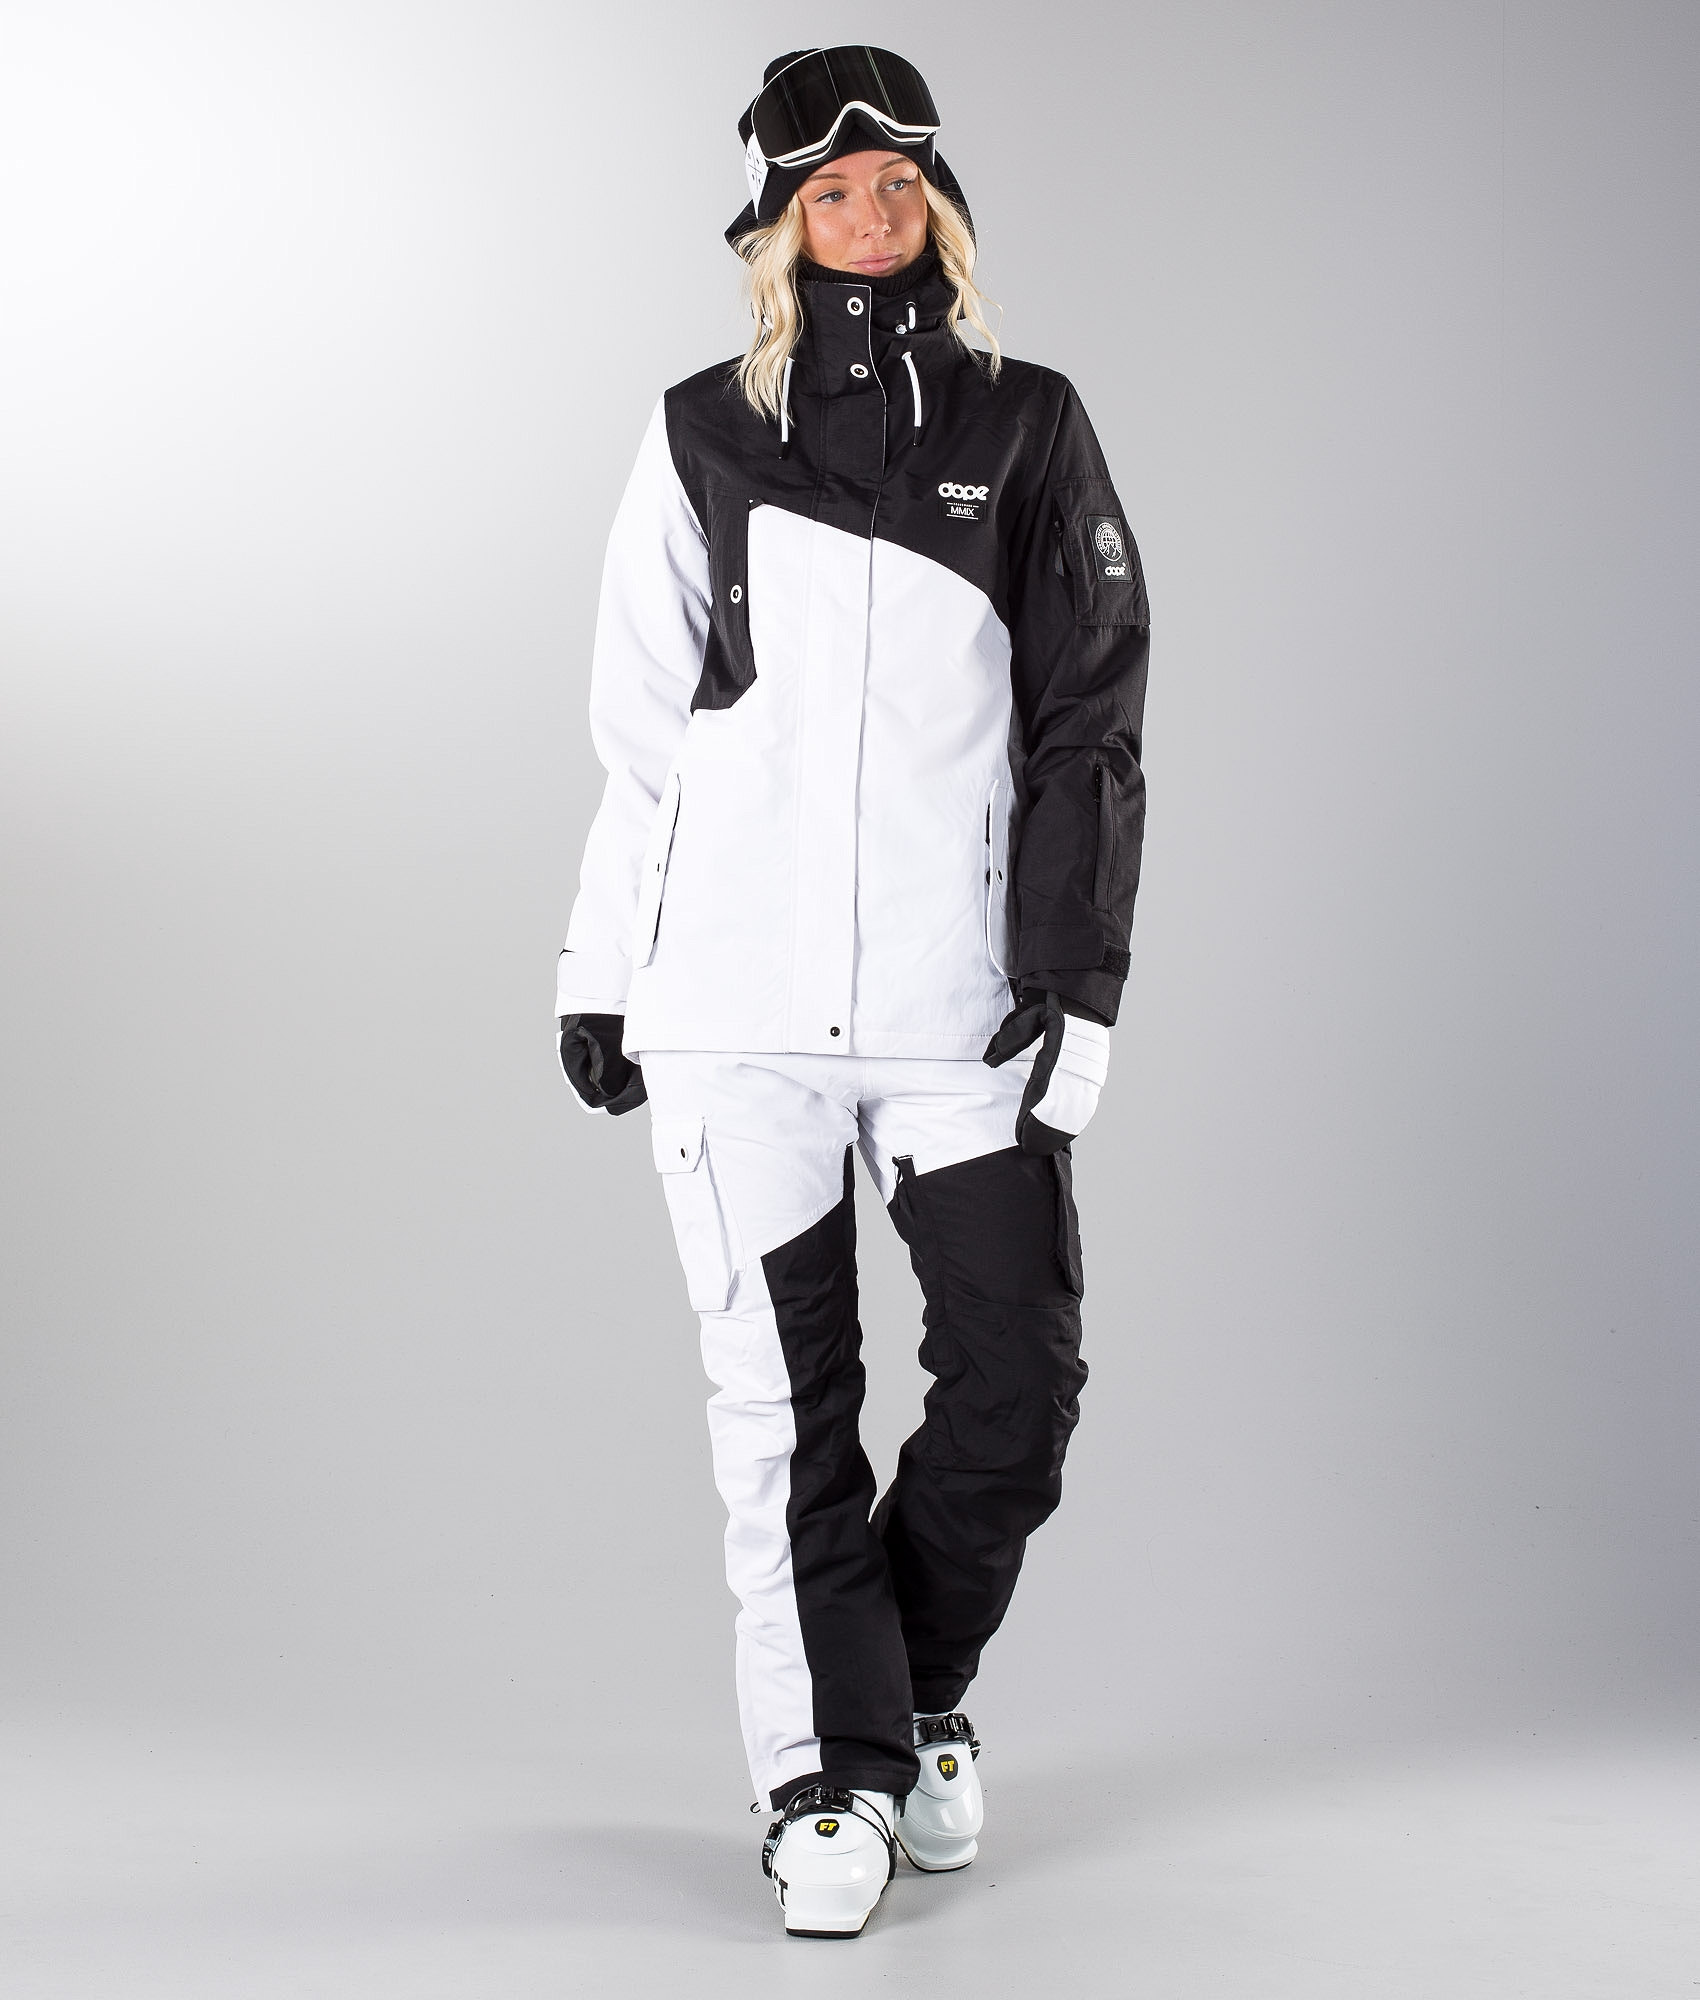 78e412a2b46b Dope Adept W Ski Jacket Black White - Ridestore.com